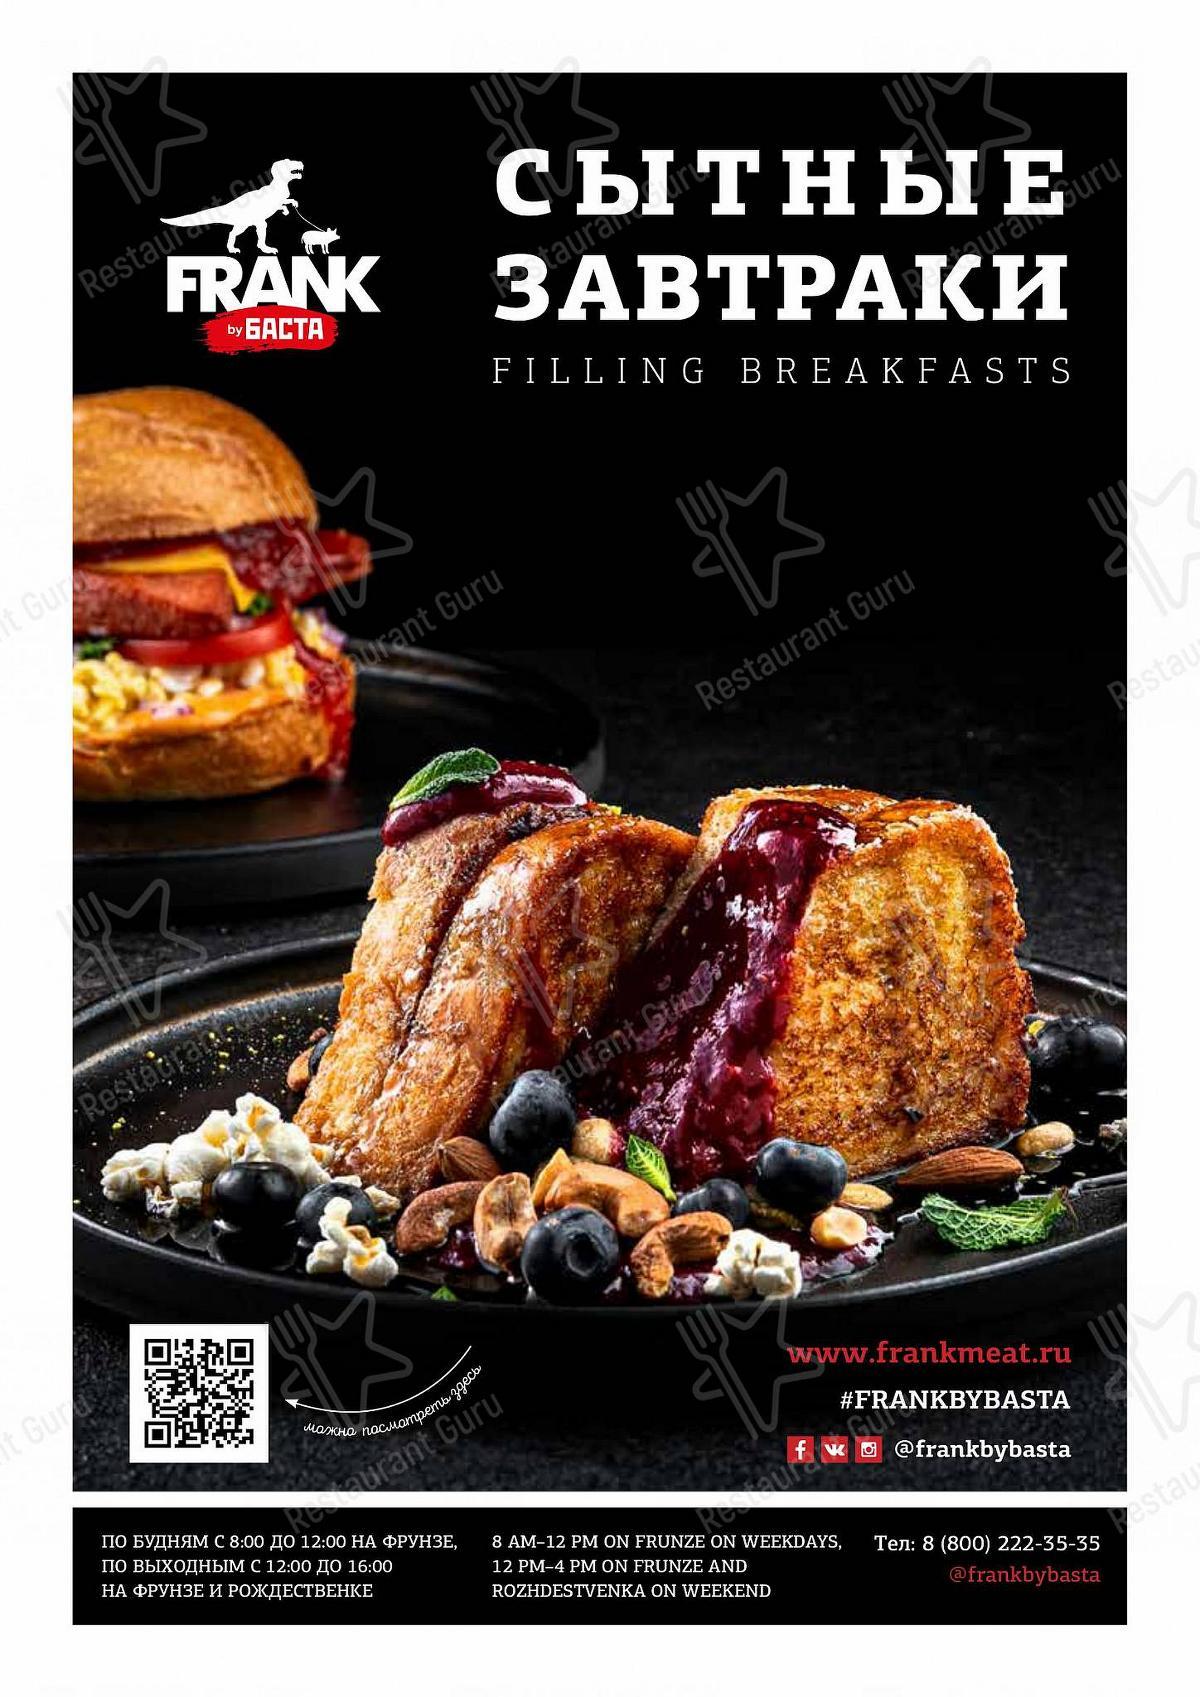 Carta de Frank - Breakfast Menu